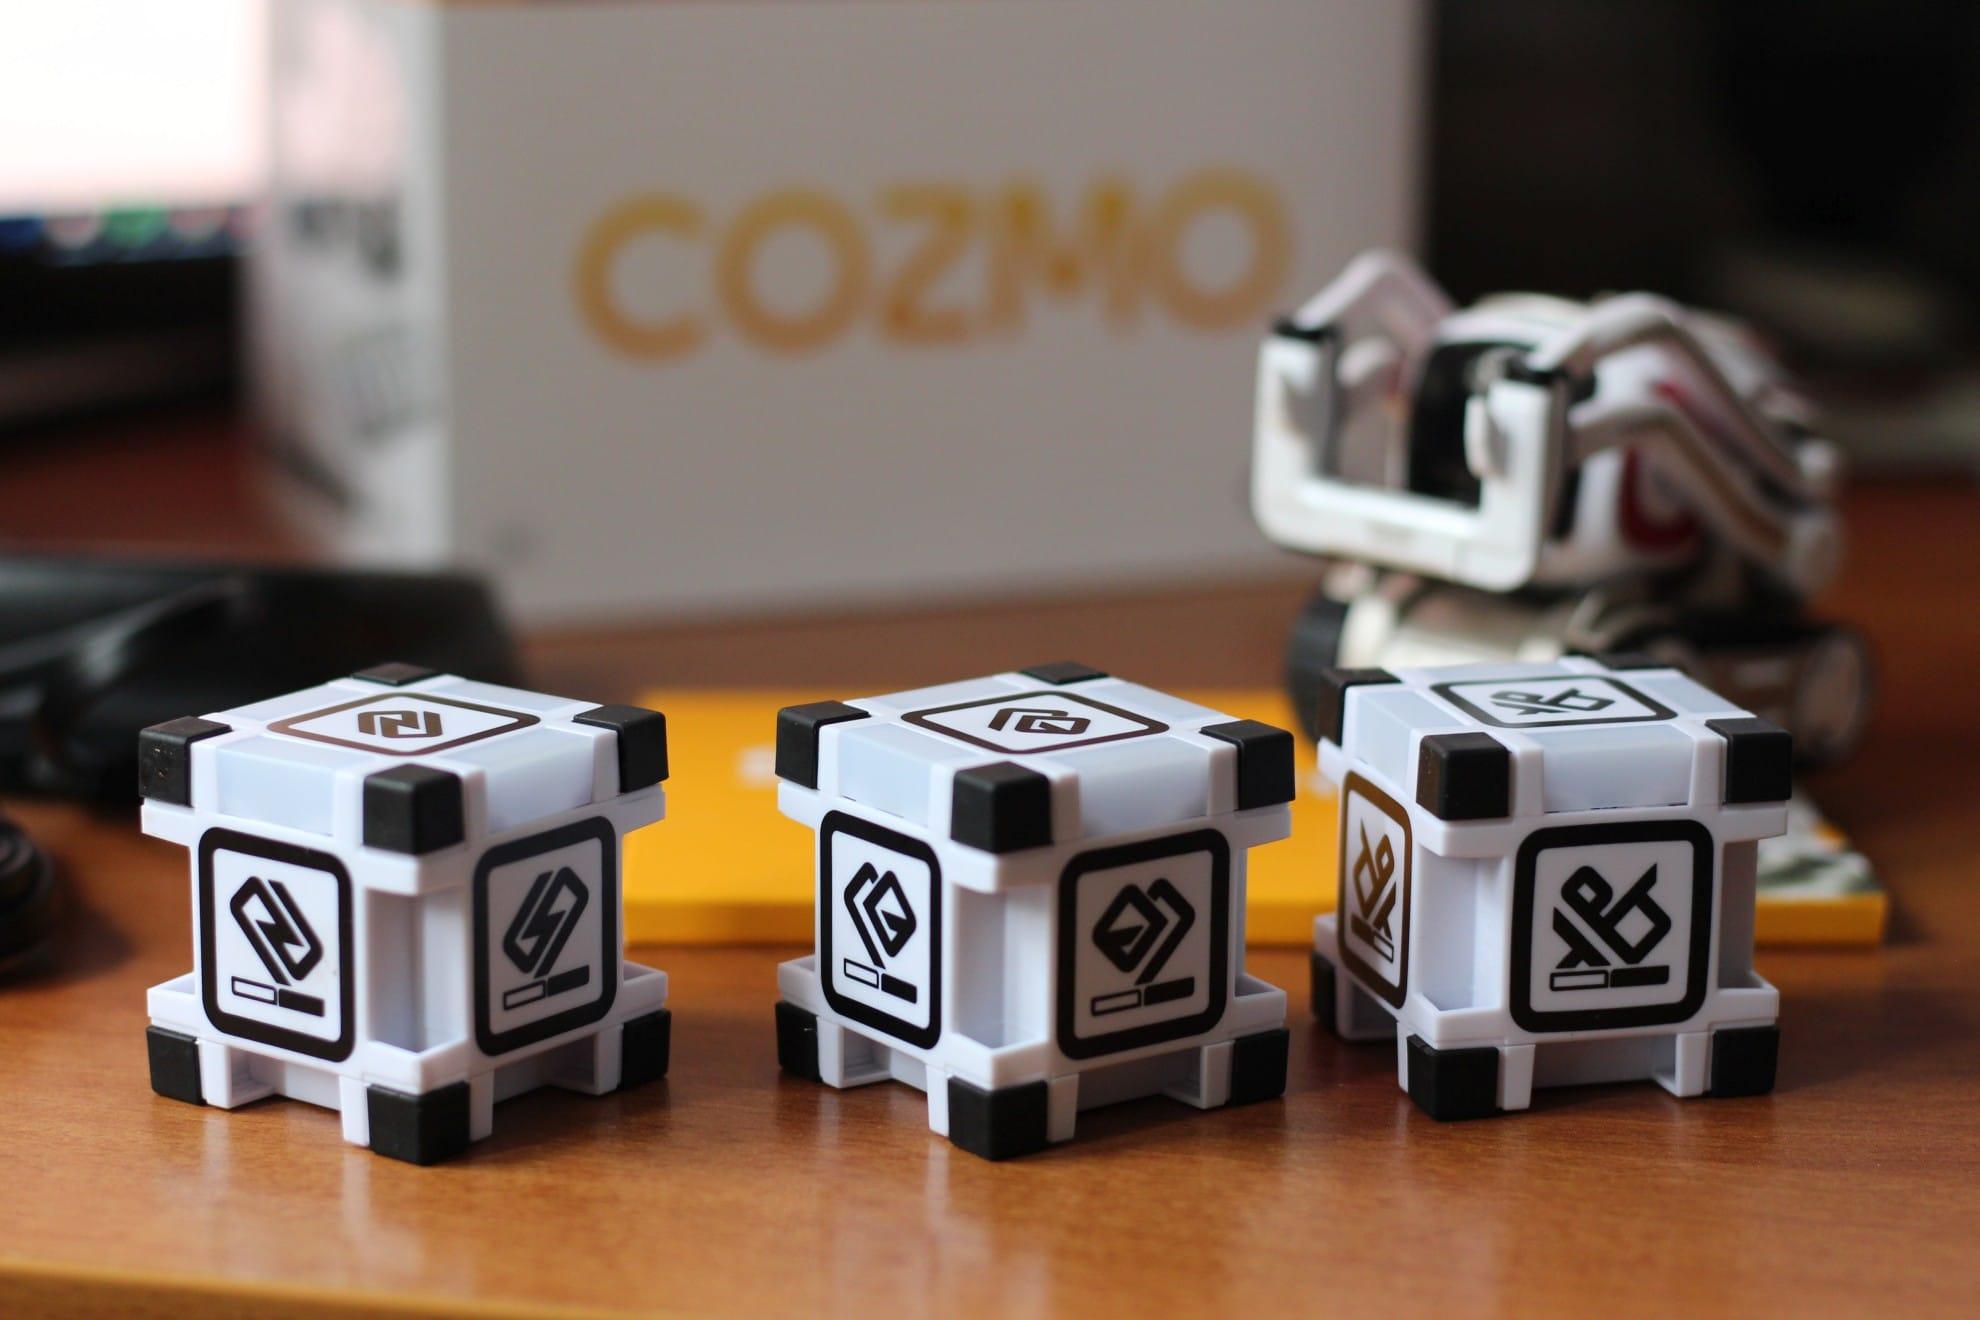 Die Würfel bereichern Cozmo sehr. (Foto: GamingGadgets.de)